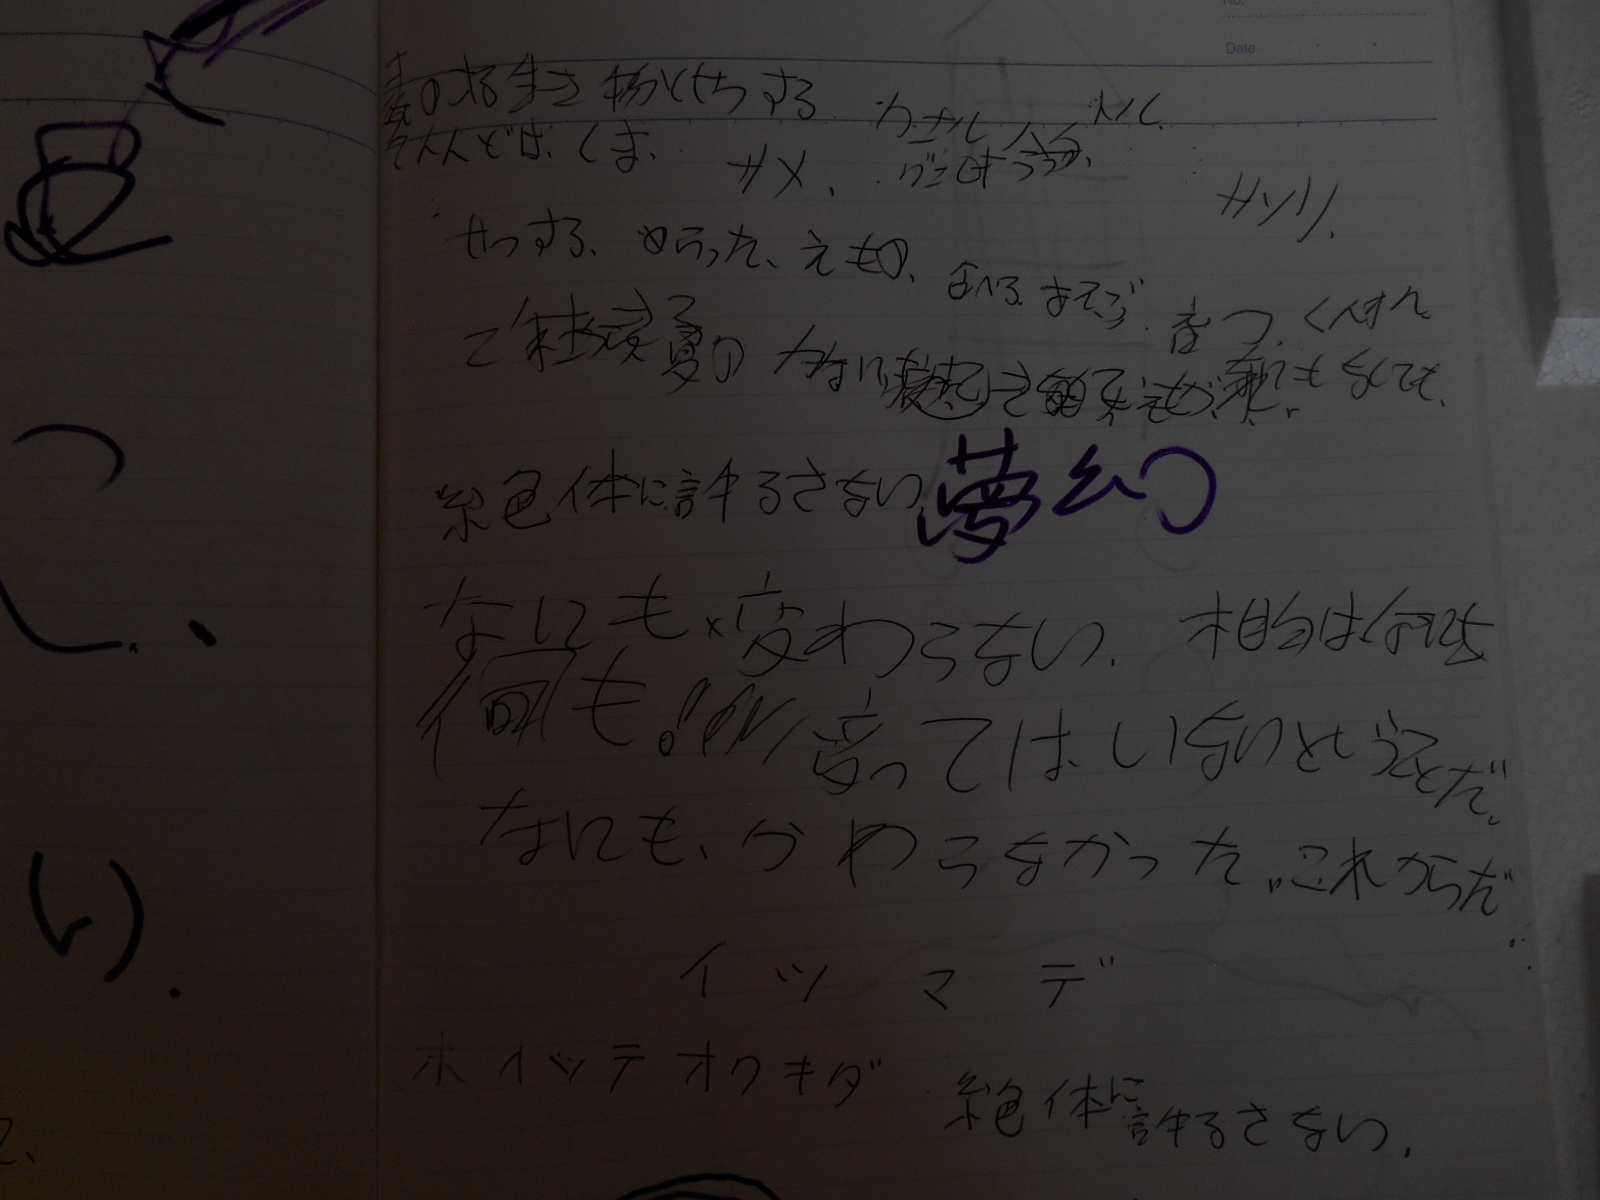 f:id:Df-kyounoyume-Sneonstiamlegnita:20170609183113j:plain